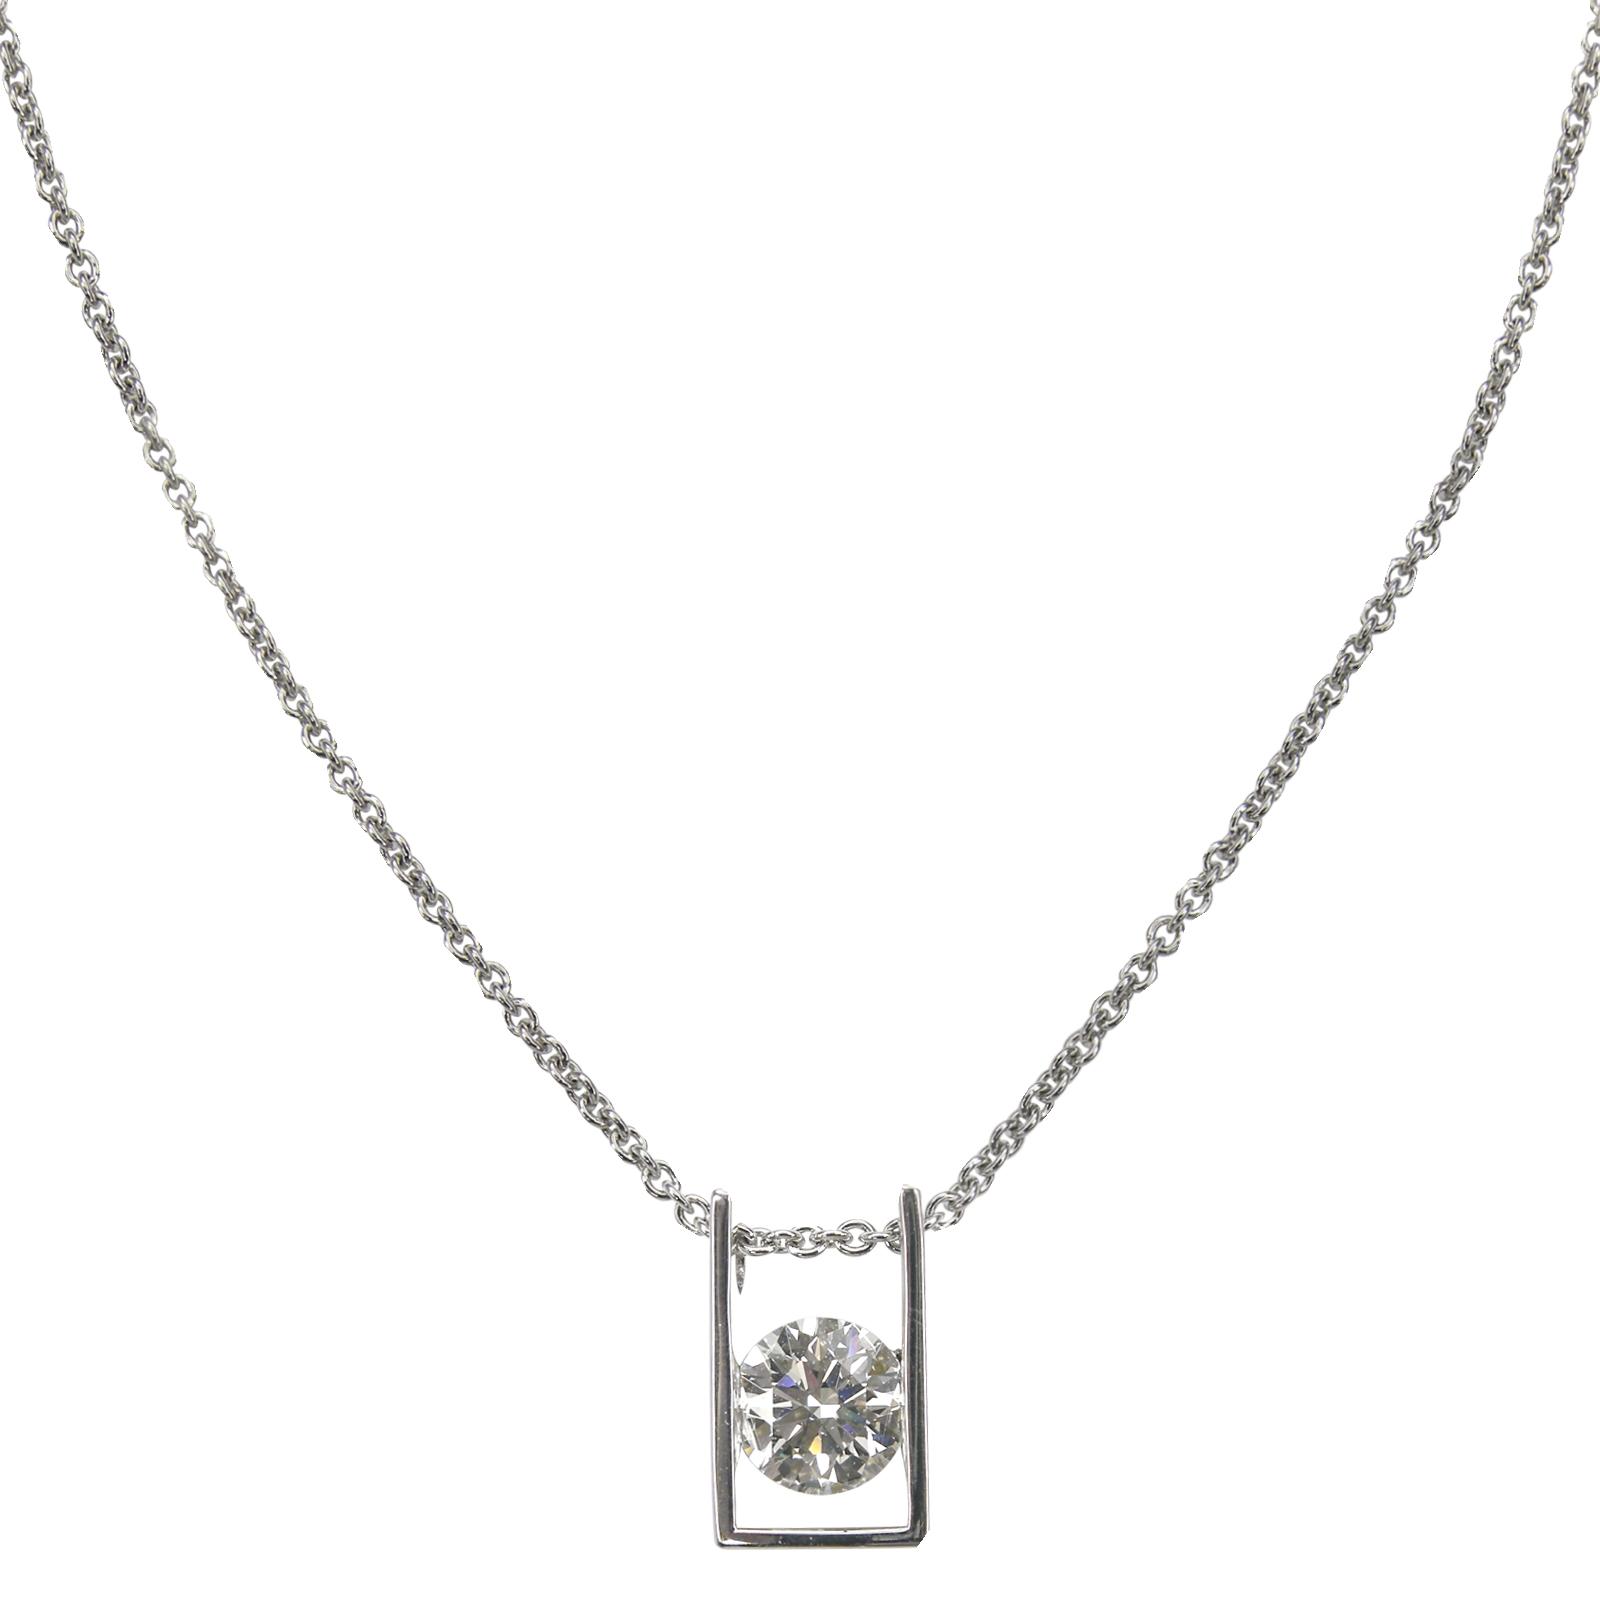 SIGNATURE DIAMOND PENDANT BESPOKE FINE JEWELLERY BY SHAHINA HATTA